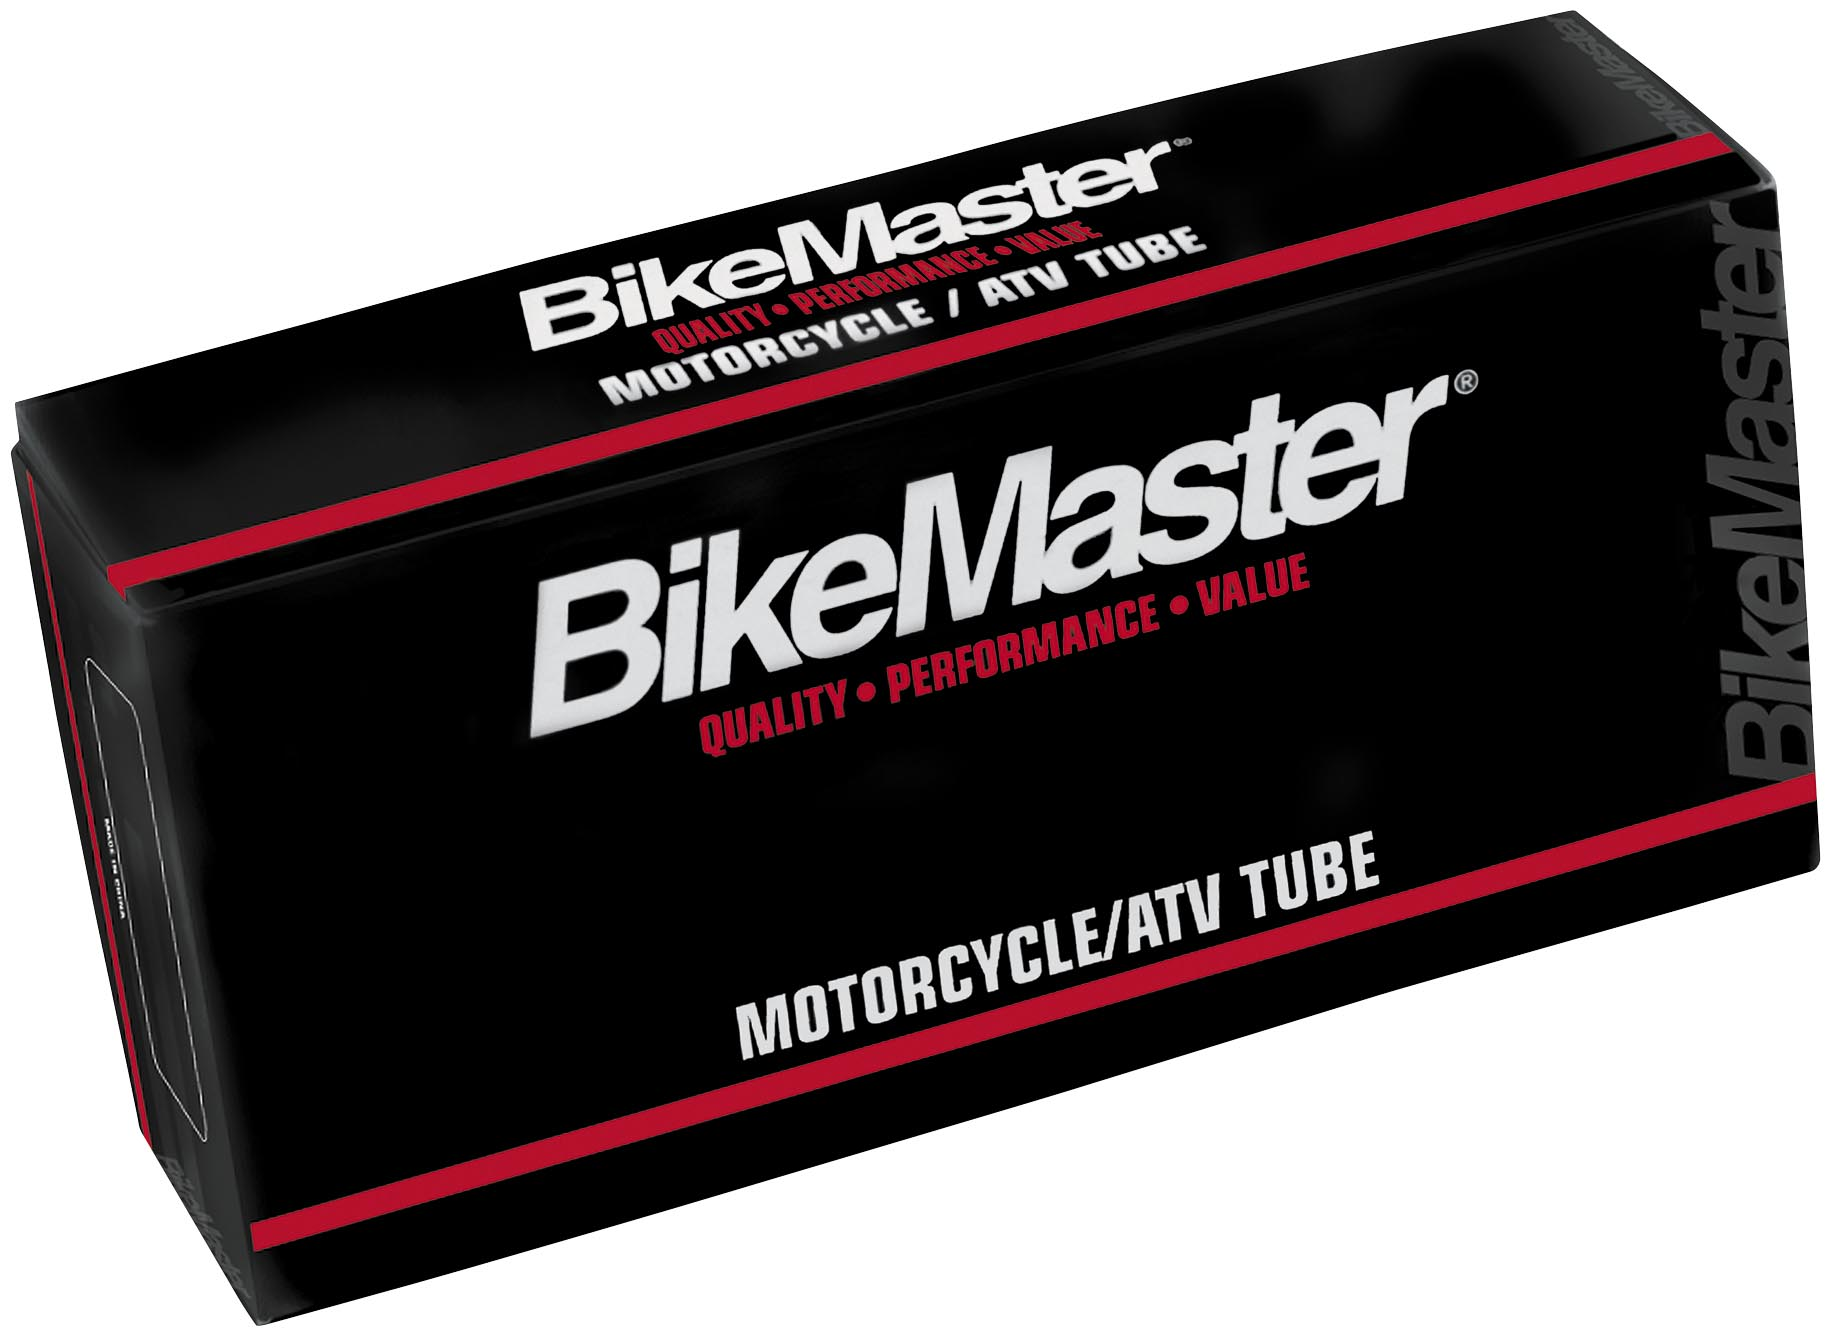 Motorcycle/ATV Tube